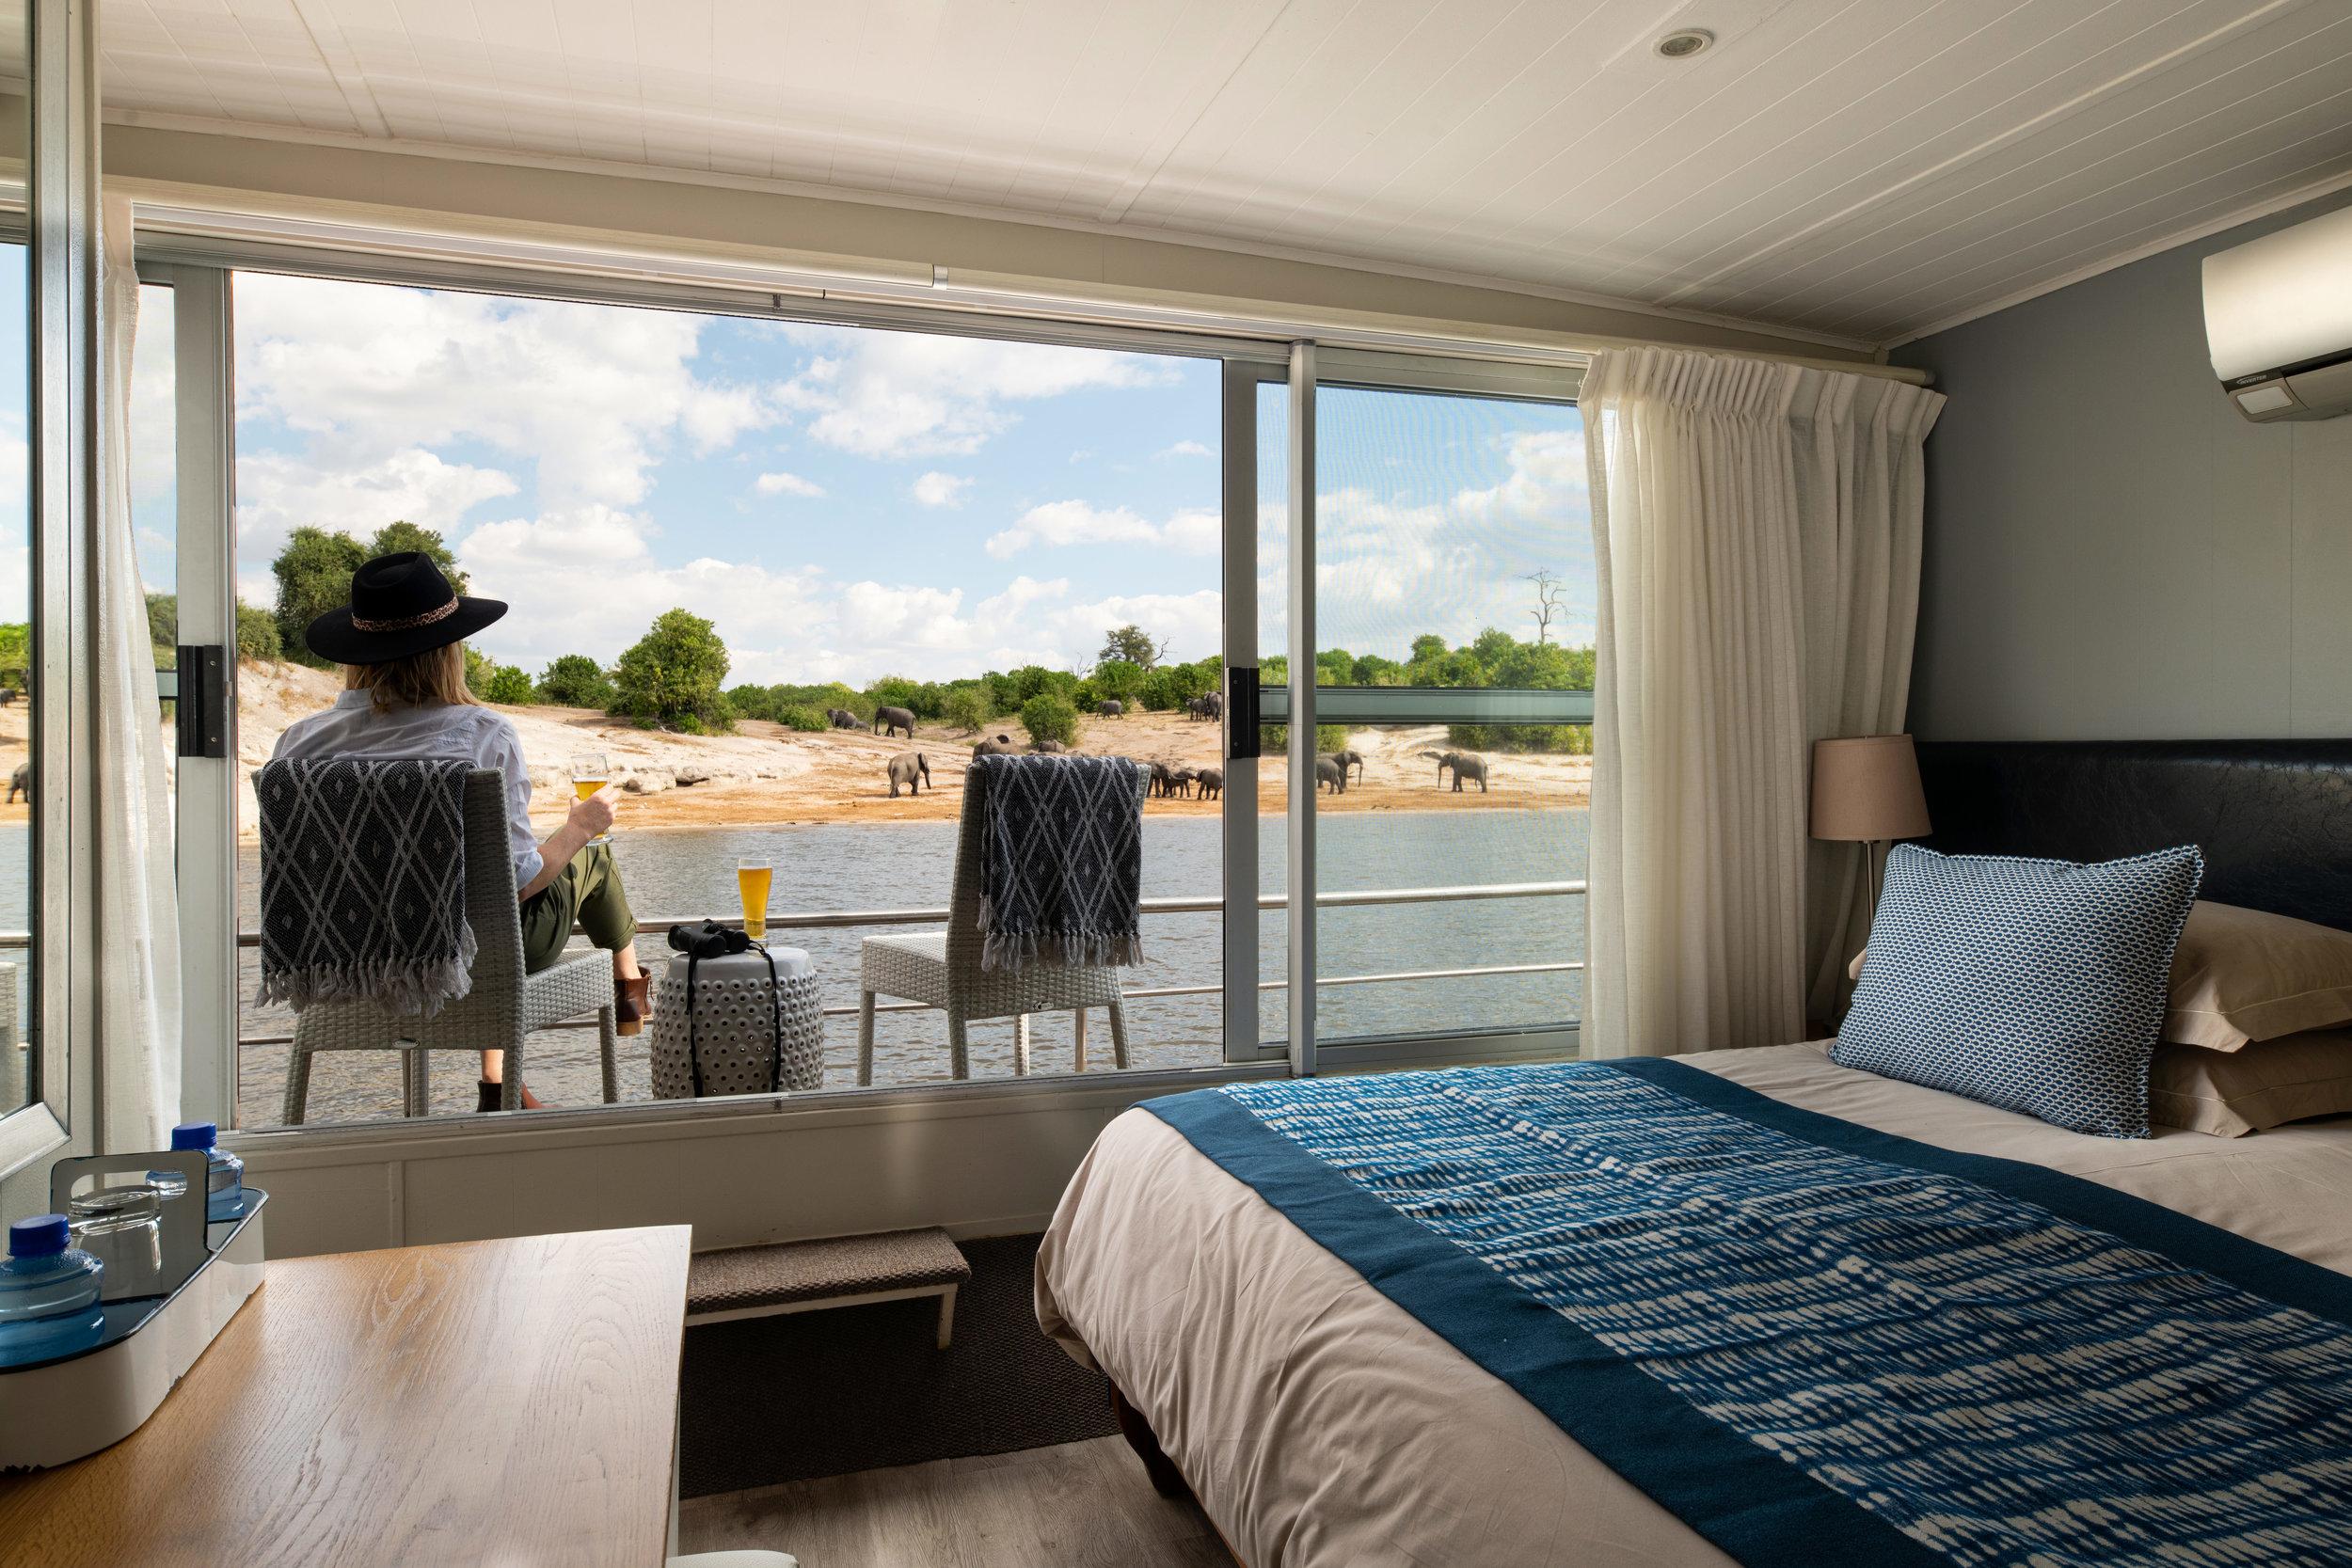 zambezi queen cruise - chobe princesses